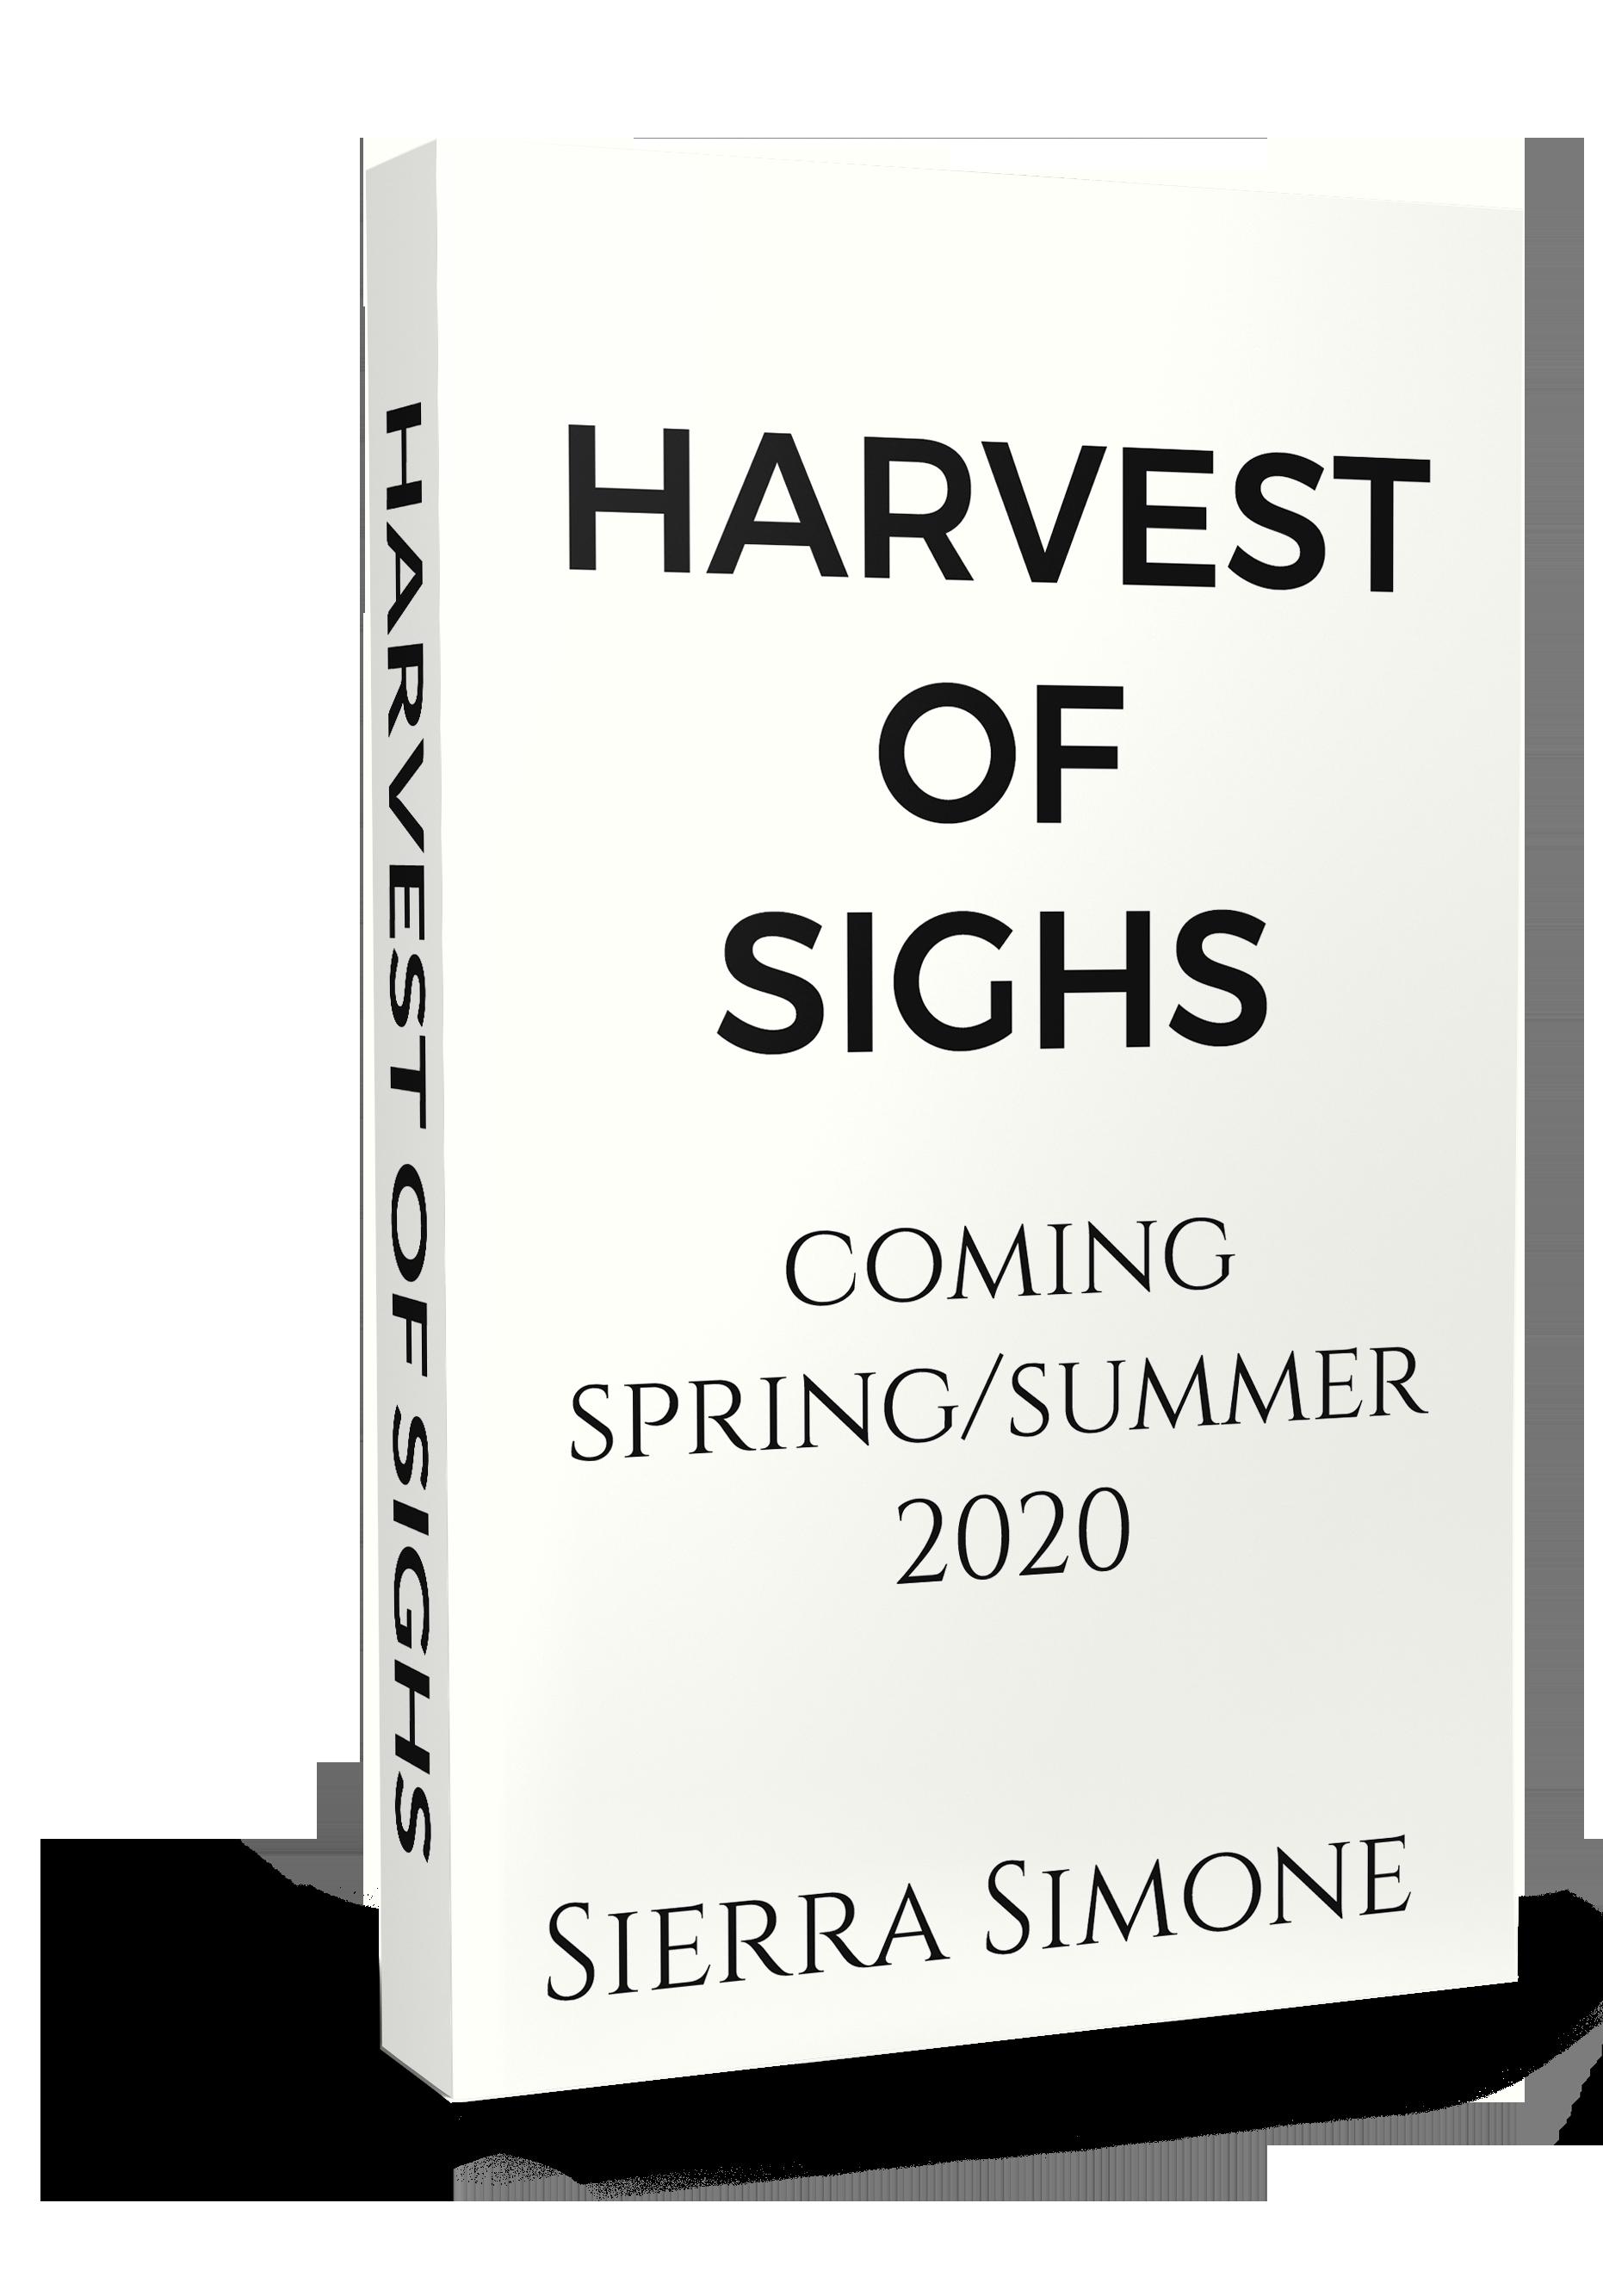 harvest of sighs temp cover pb mockup.png